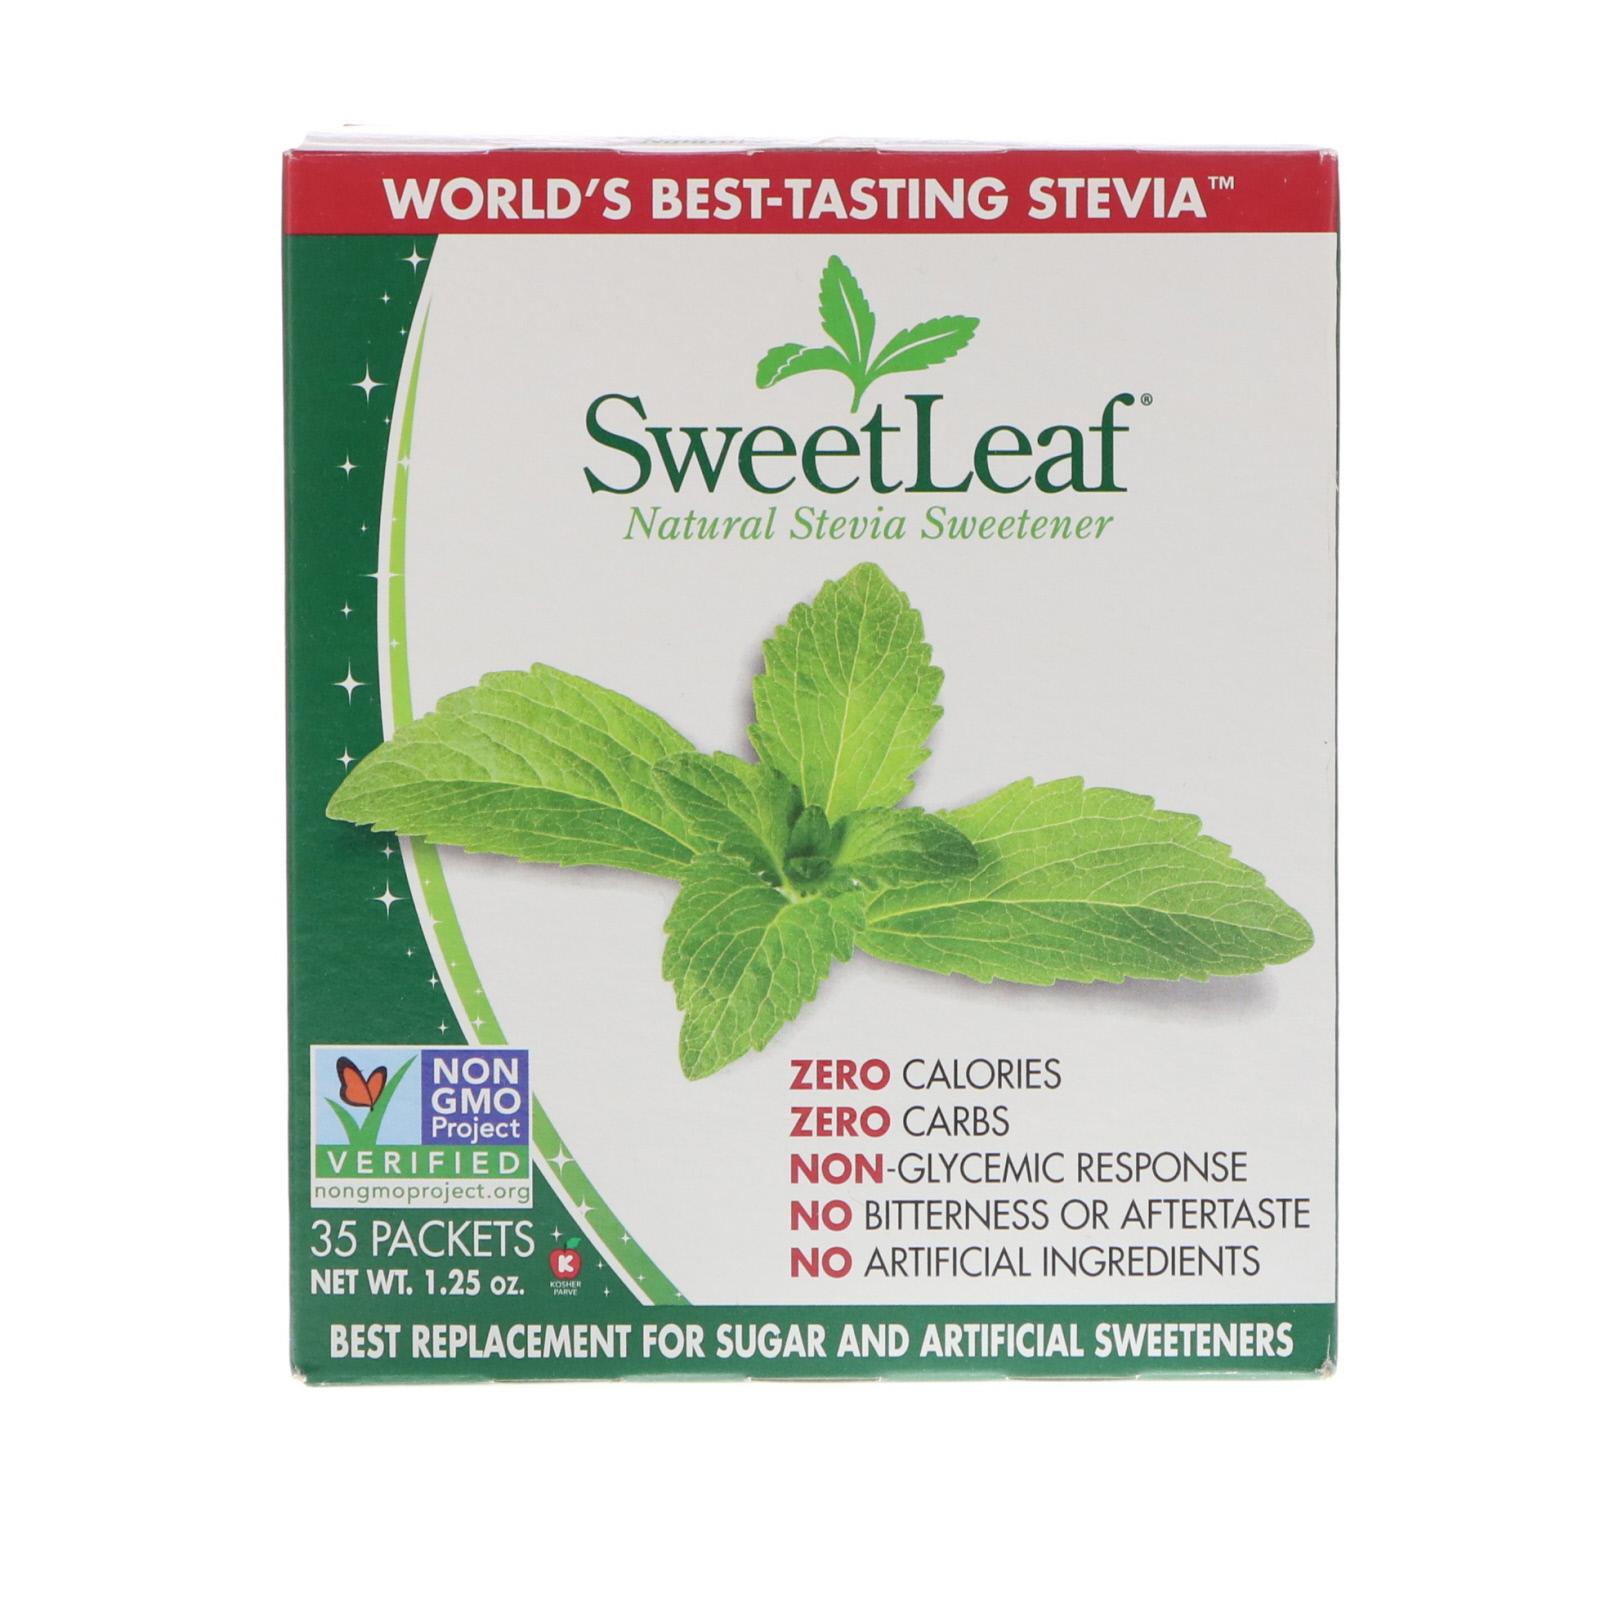 Wisdom Natural Sweetleaf محلي الستيفيا الطبيعي 35 عبوة 1 25 أوقية Iherb